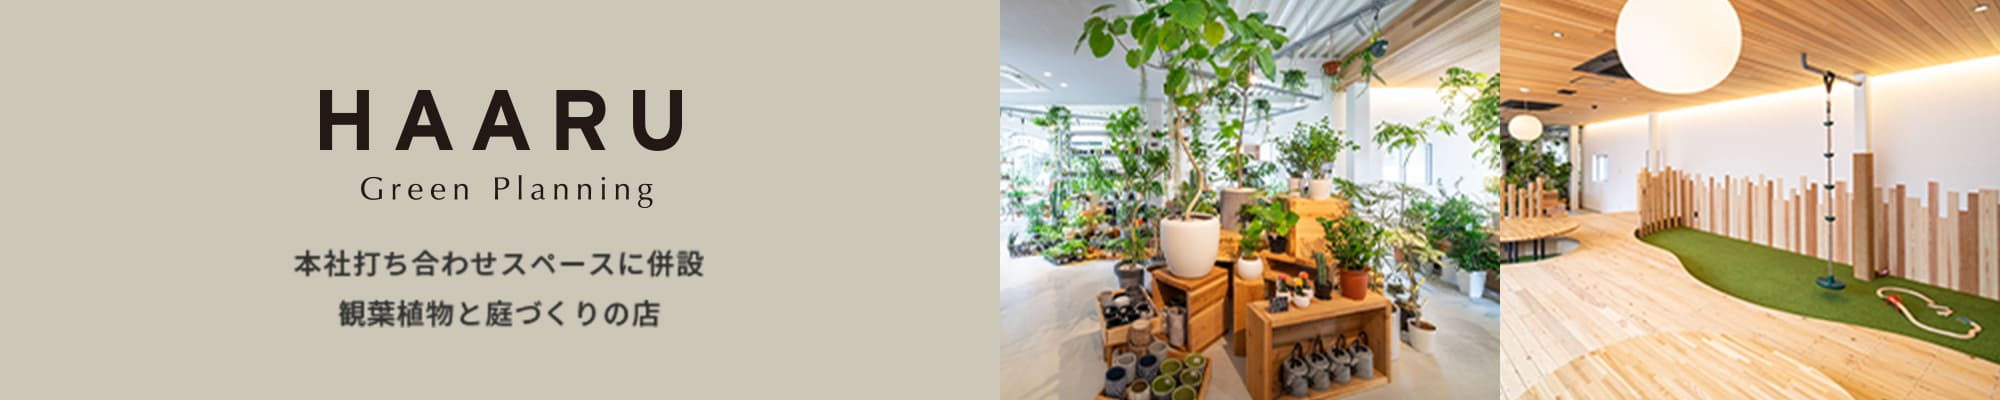 HAARU Green Planning